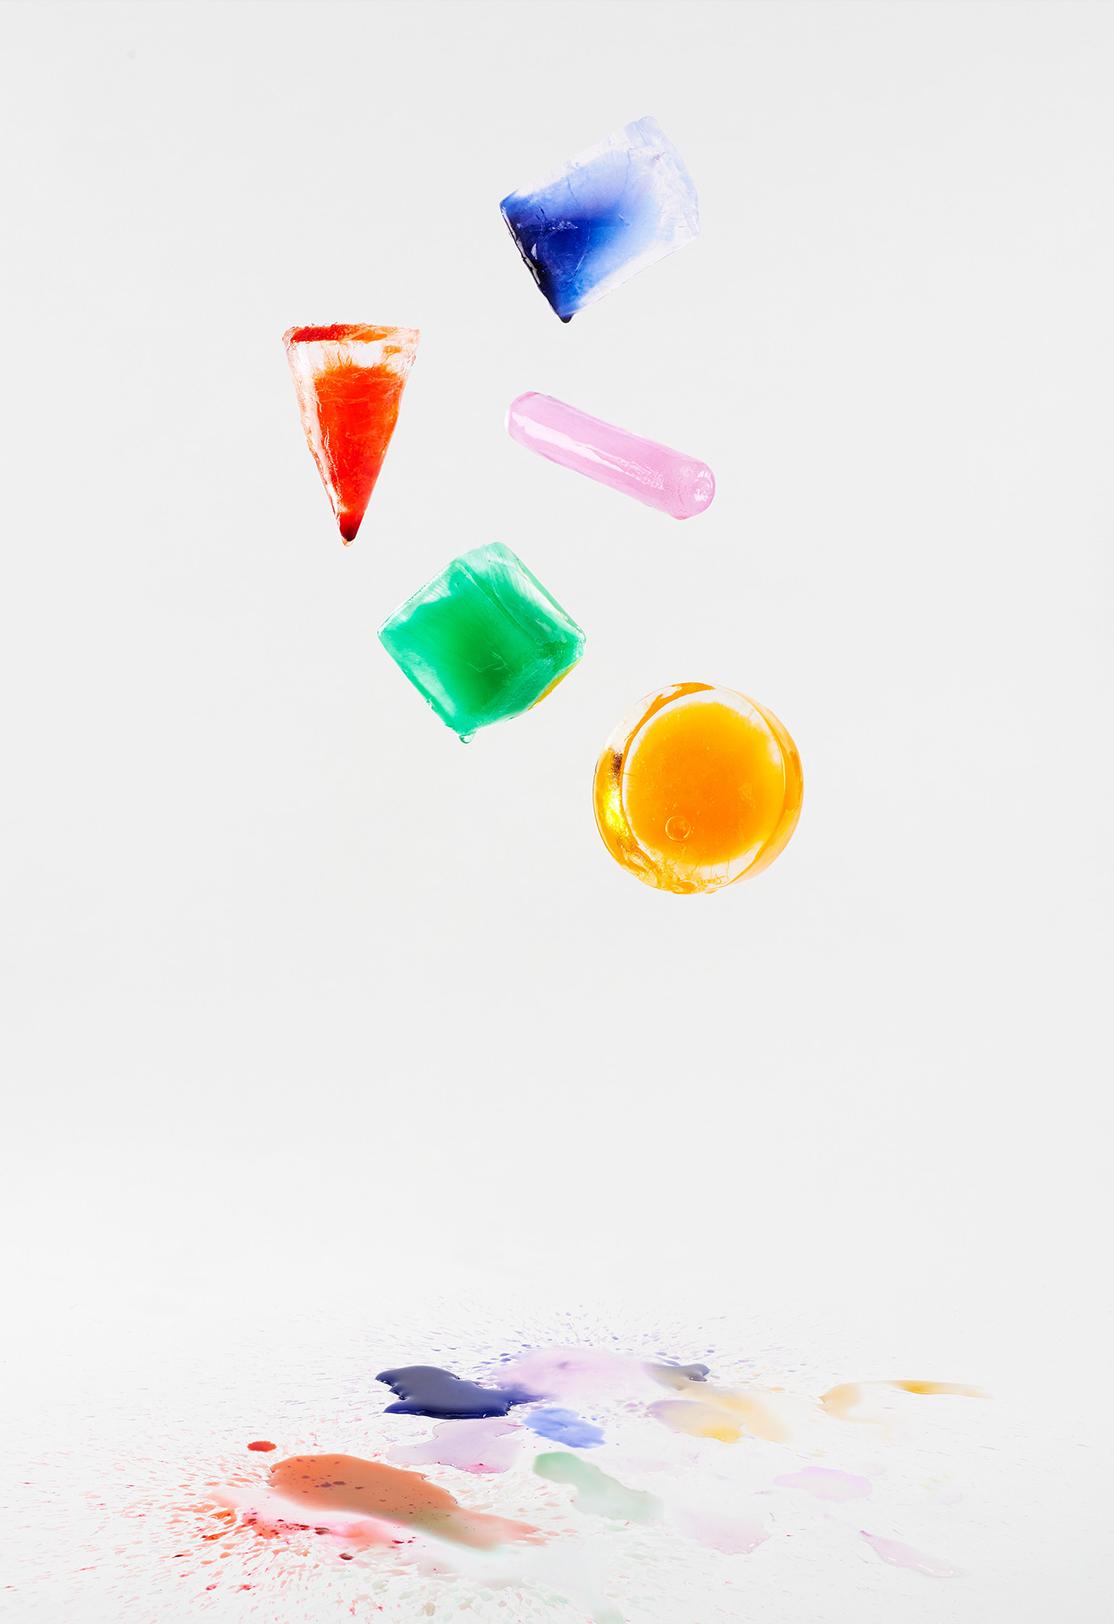 jll photographies fusion chromatic paris 2015 bye bye bambi collaboration